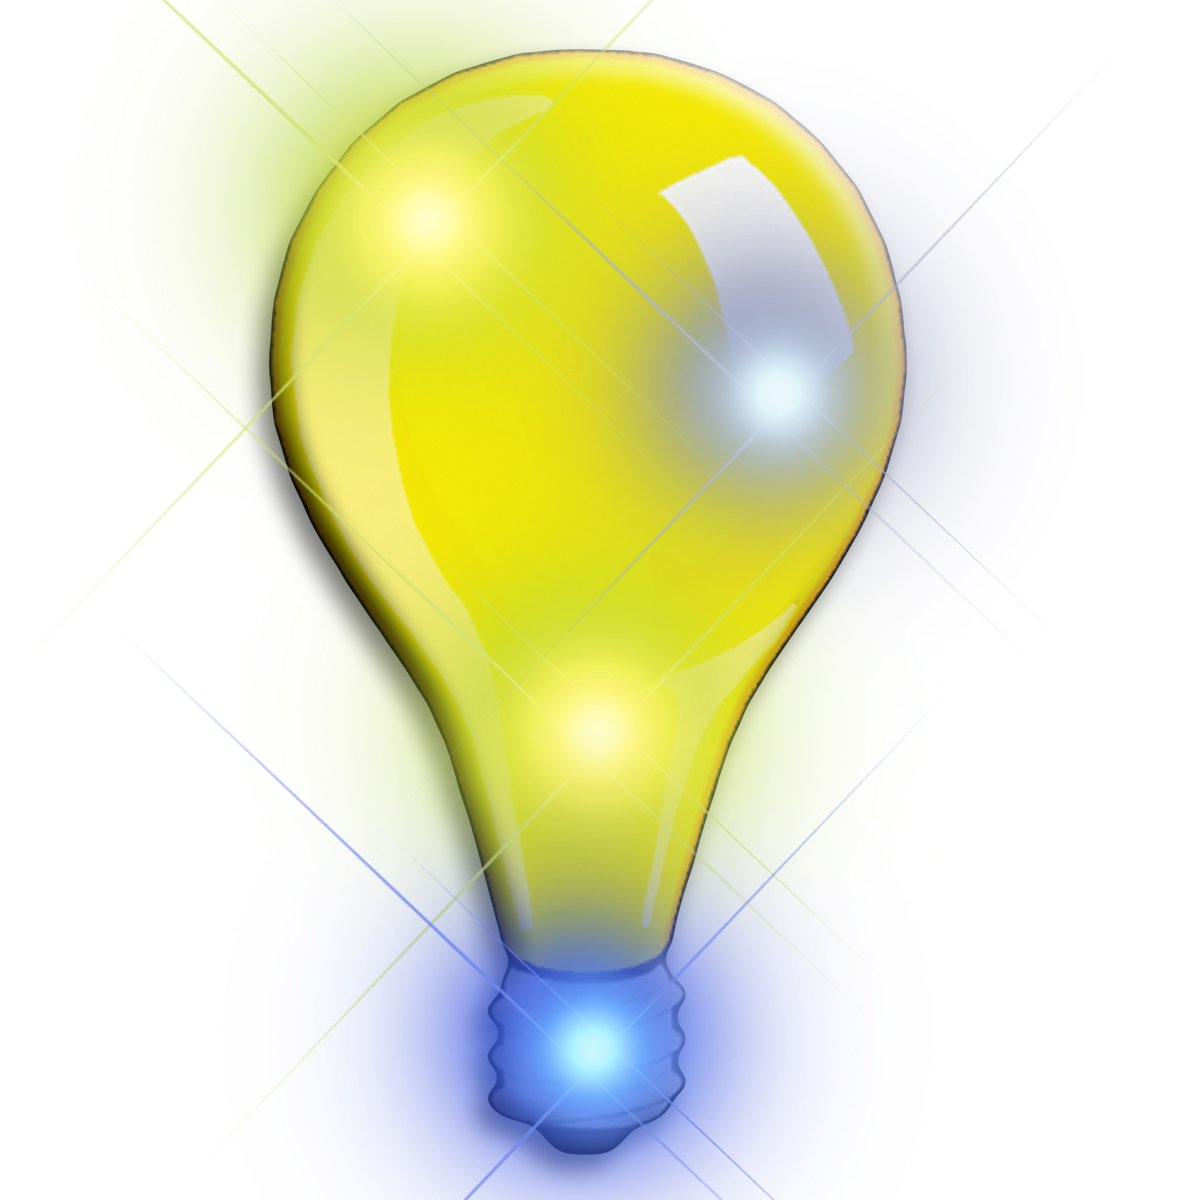 Lightbulb Flashing Body Light Lapel Pins All Body Lights and Blinkees